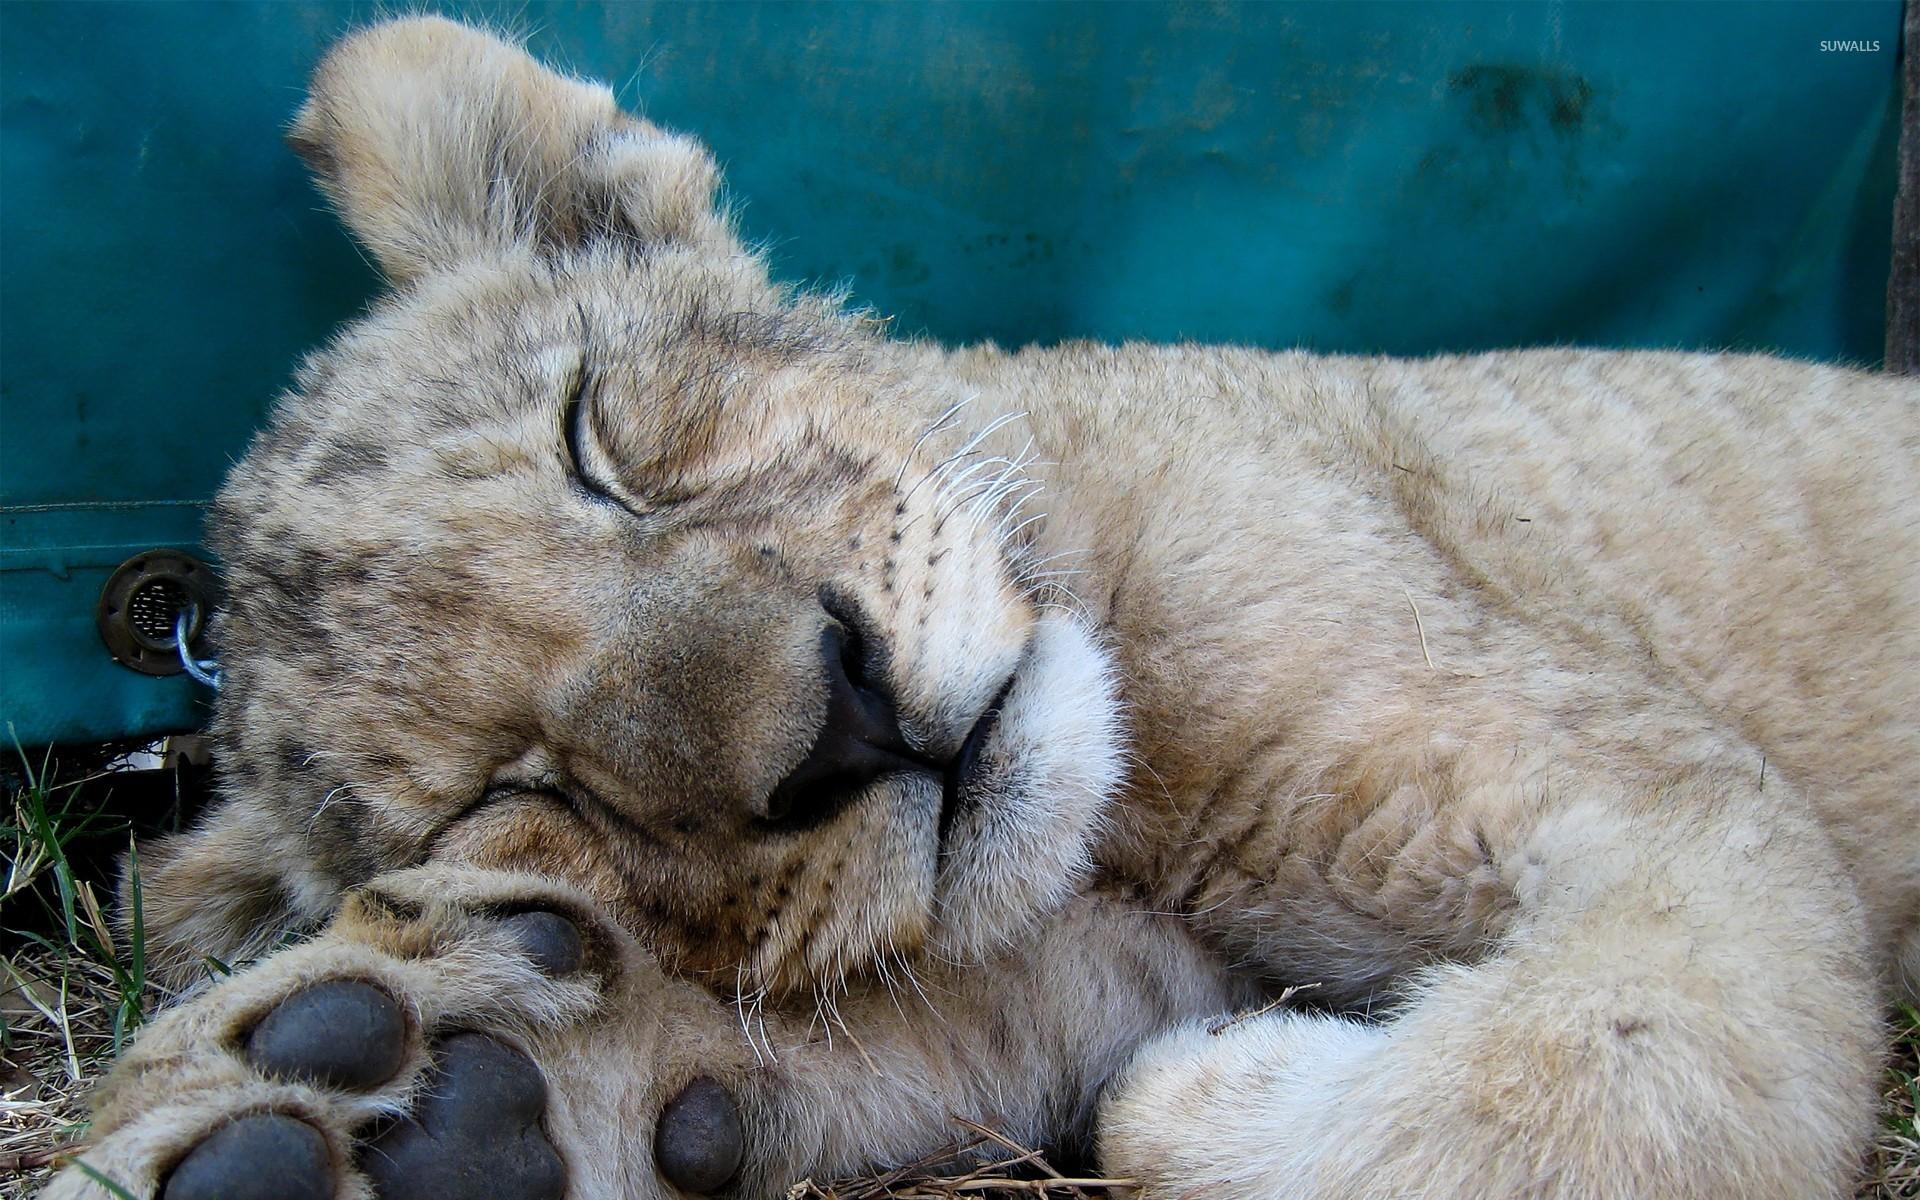 Sleeping Lion Cub Wallpaper Animal Wallpapers 20801